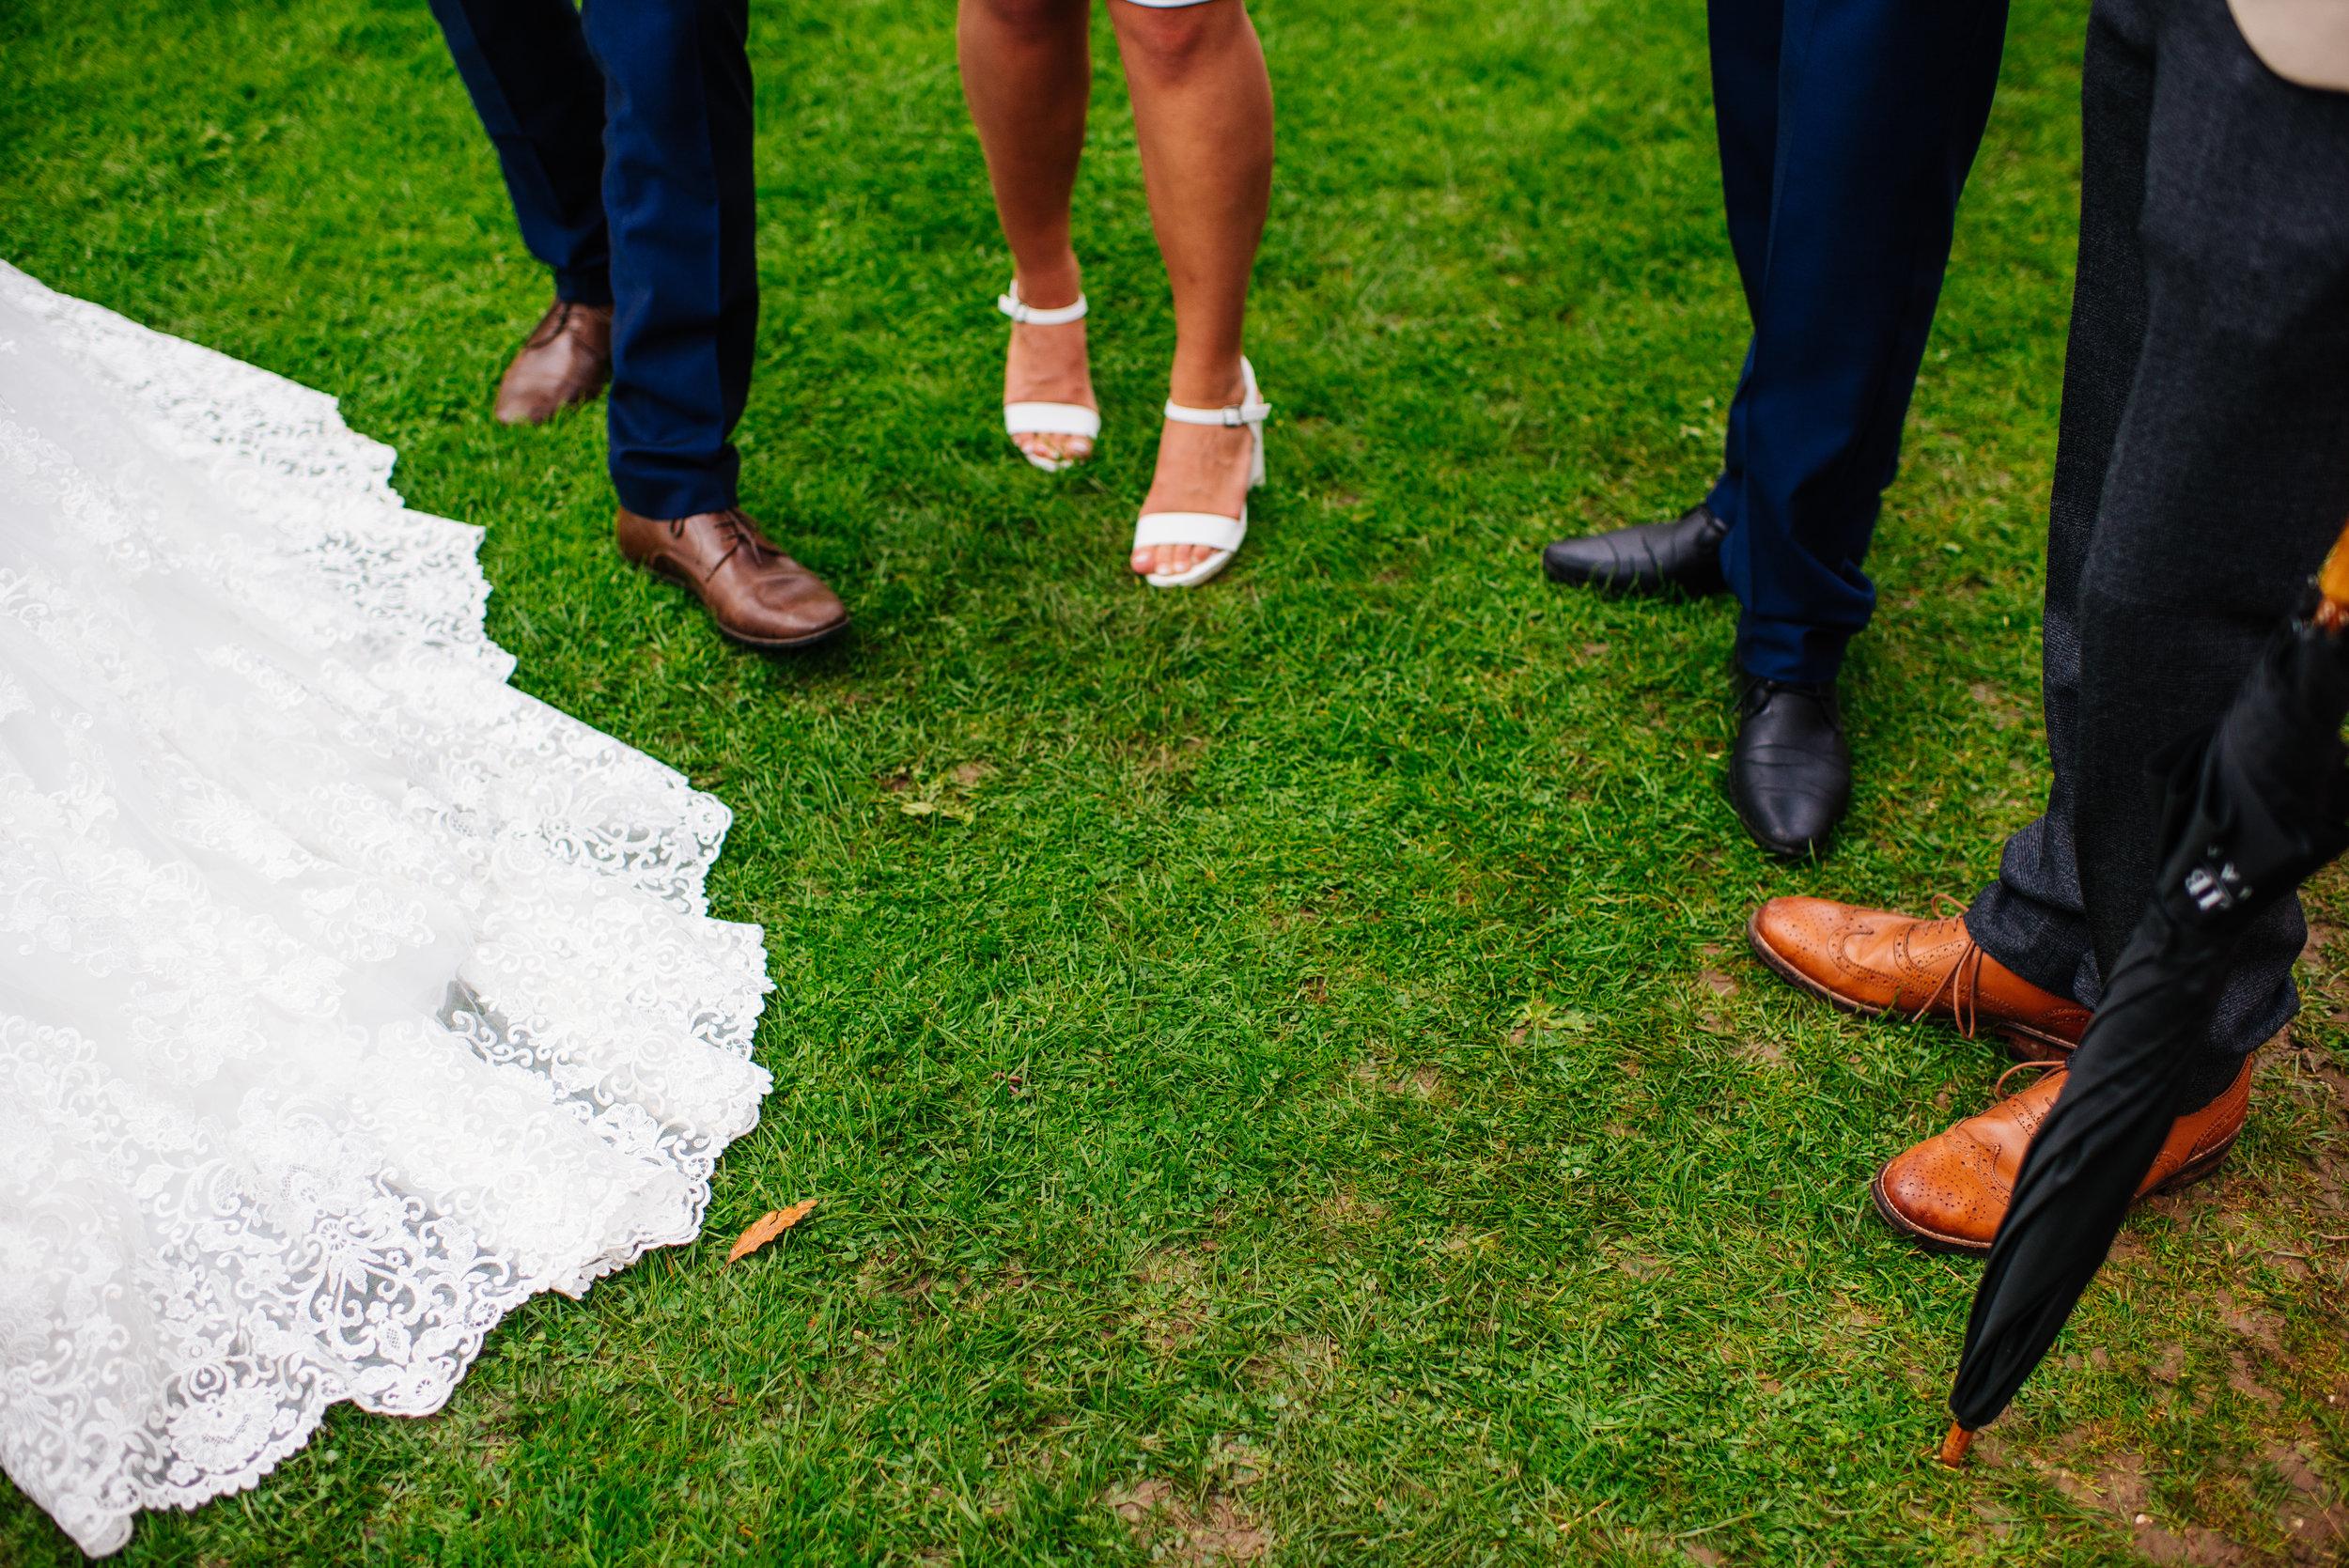 22 Lillibrooke Manor Berkshire Shoes Dress Grass Wedding Photography.jpg